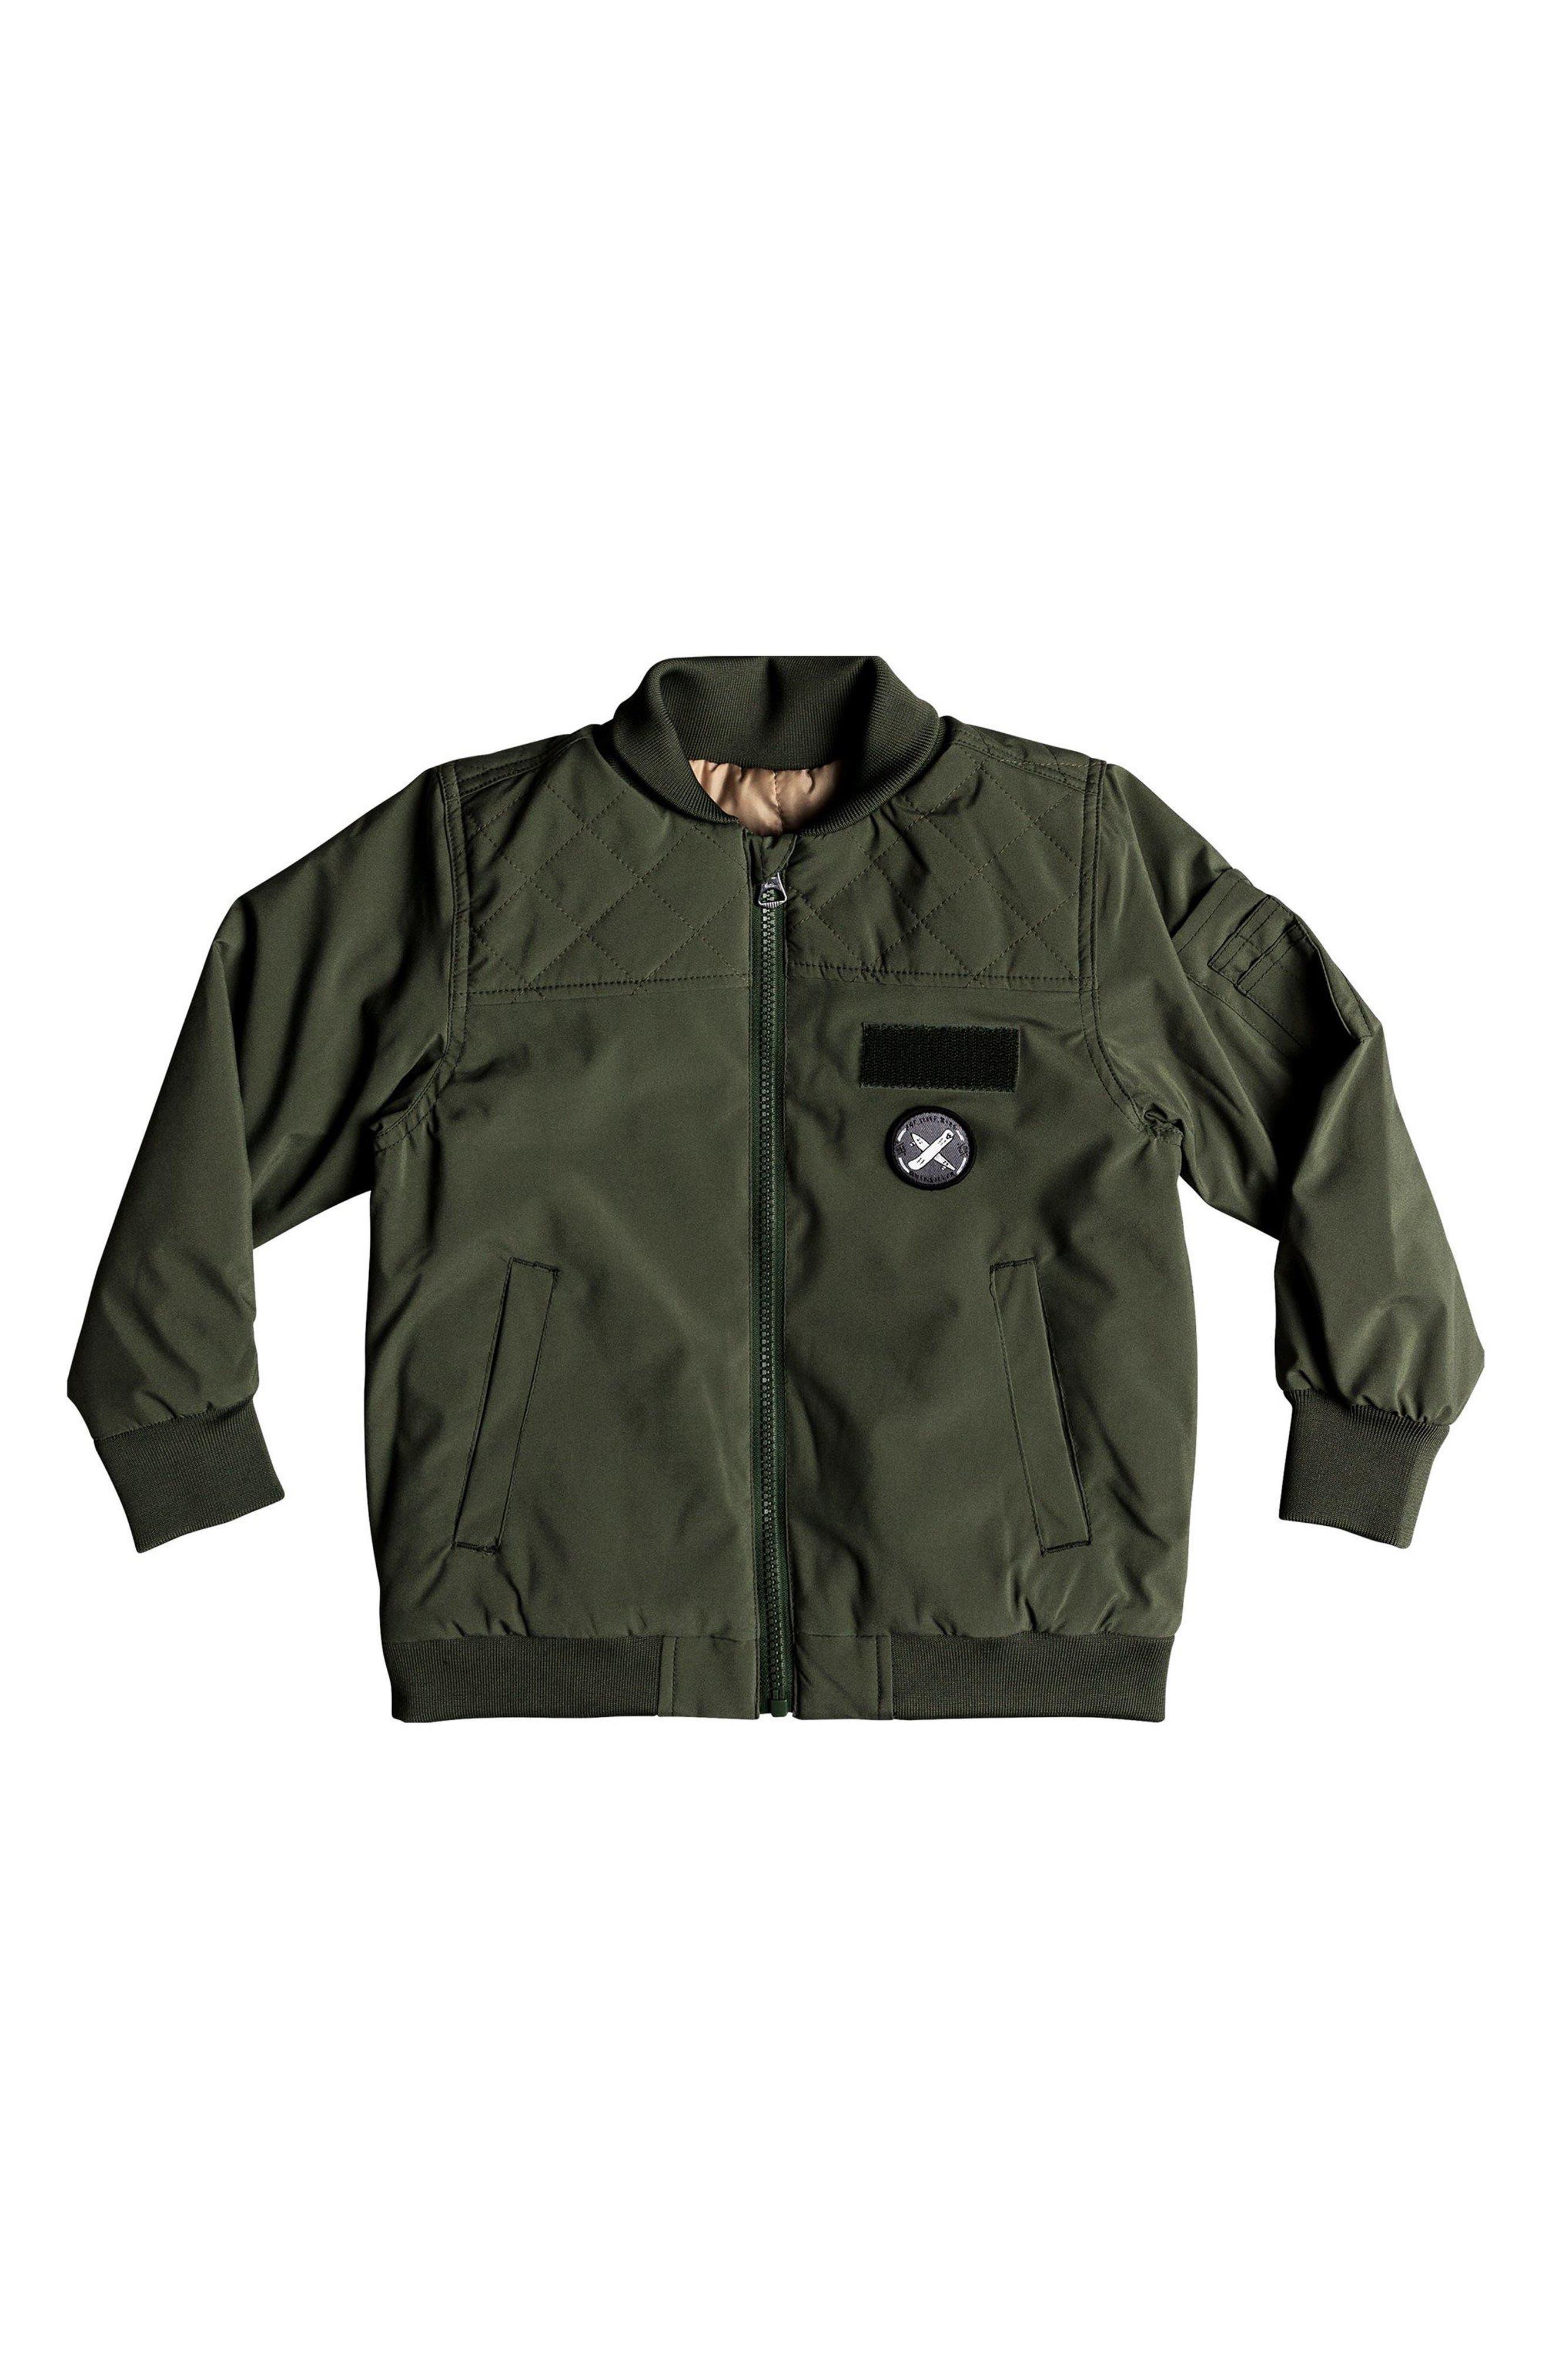 Mankai Sun Bomber Jacket,                             Main thumbnail 1, color,                             THYME